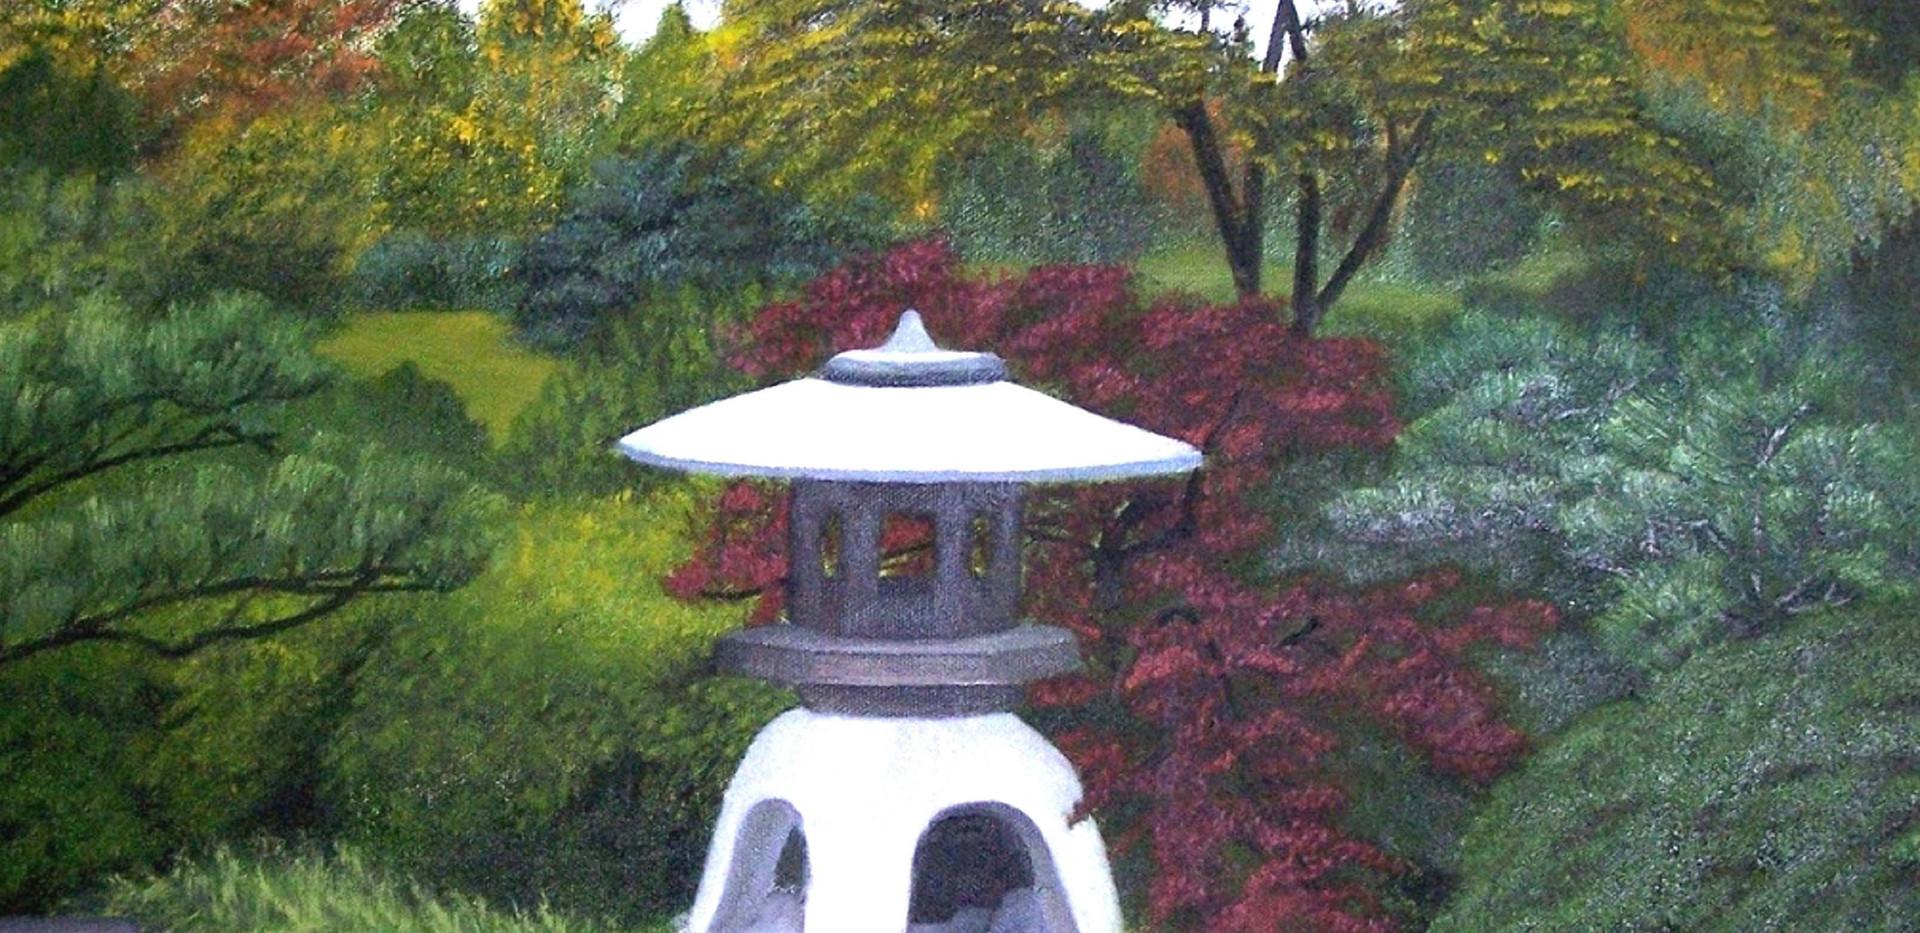 Shaw_s-Jap.-Garden-8-x-10.jpg